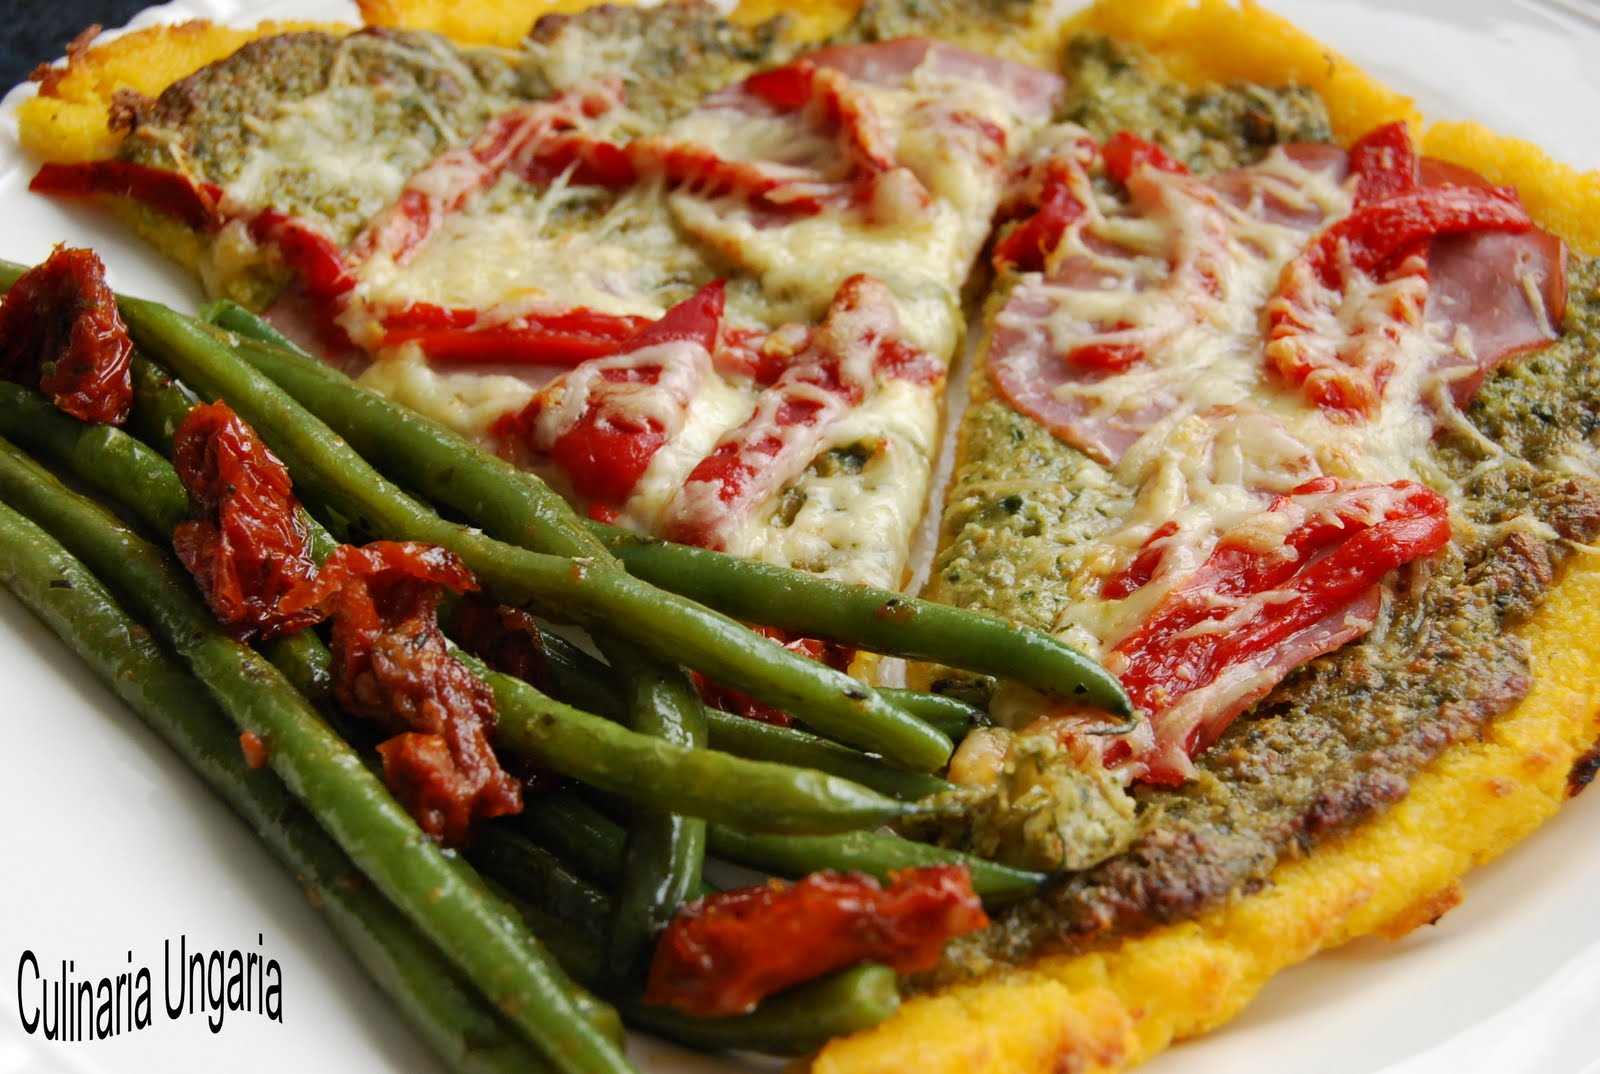 culinaria ungaria polenta pizza mit gr nen bohnen. Black Bedroom Furniture Sets. Home Design Ideas